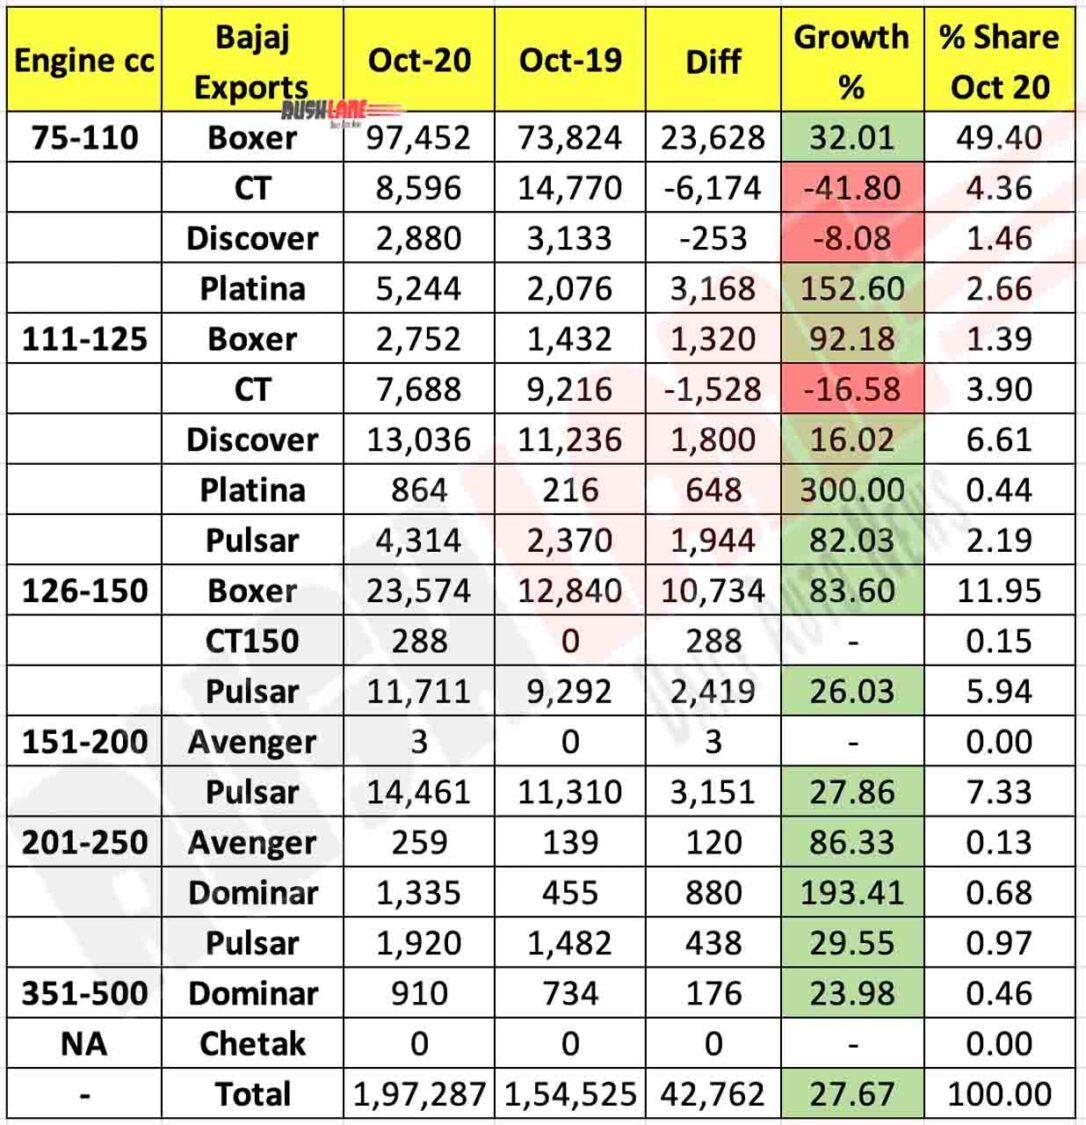 Bajaj Exports Oct 2020